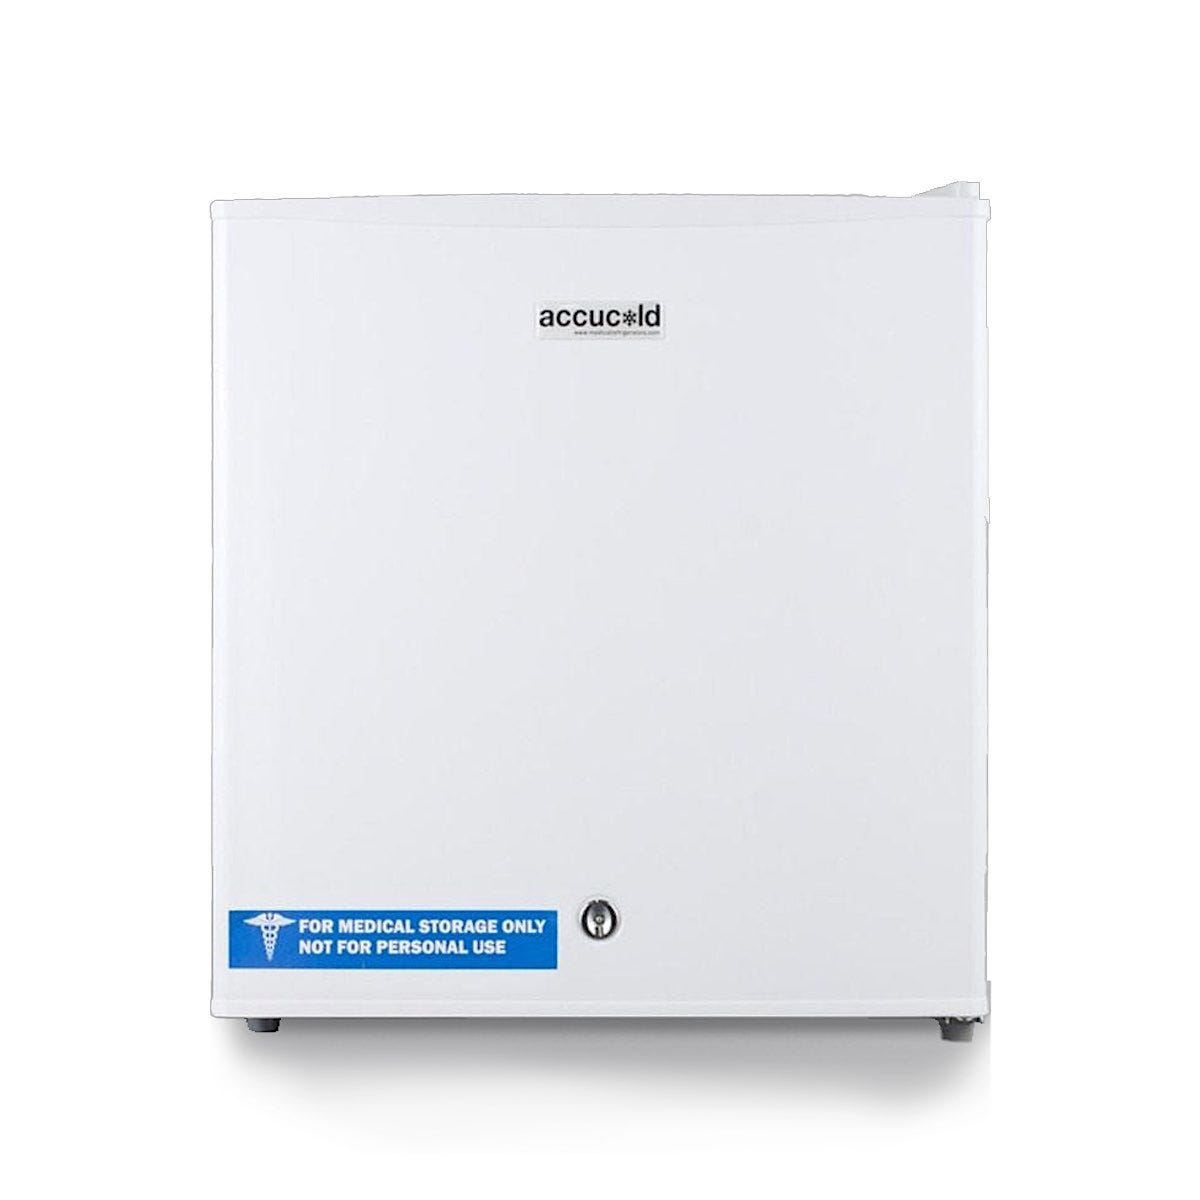 Summit 1.8 Cu. Ft. Refrigerator, Manual Defrost with Lock